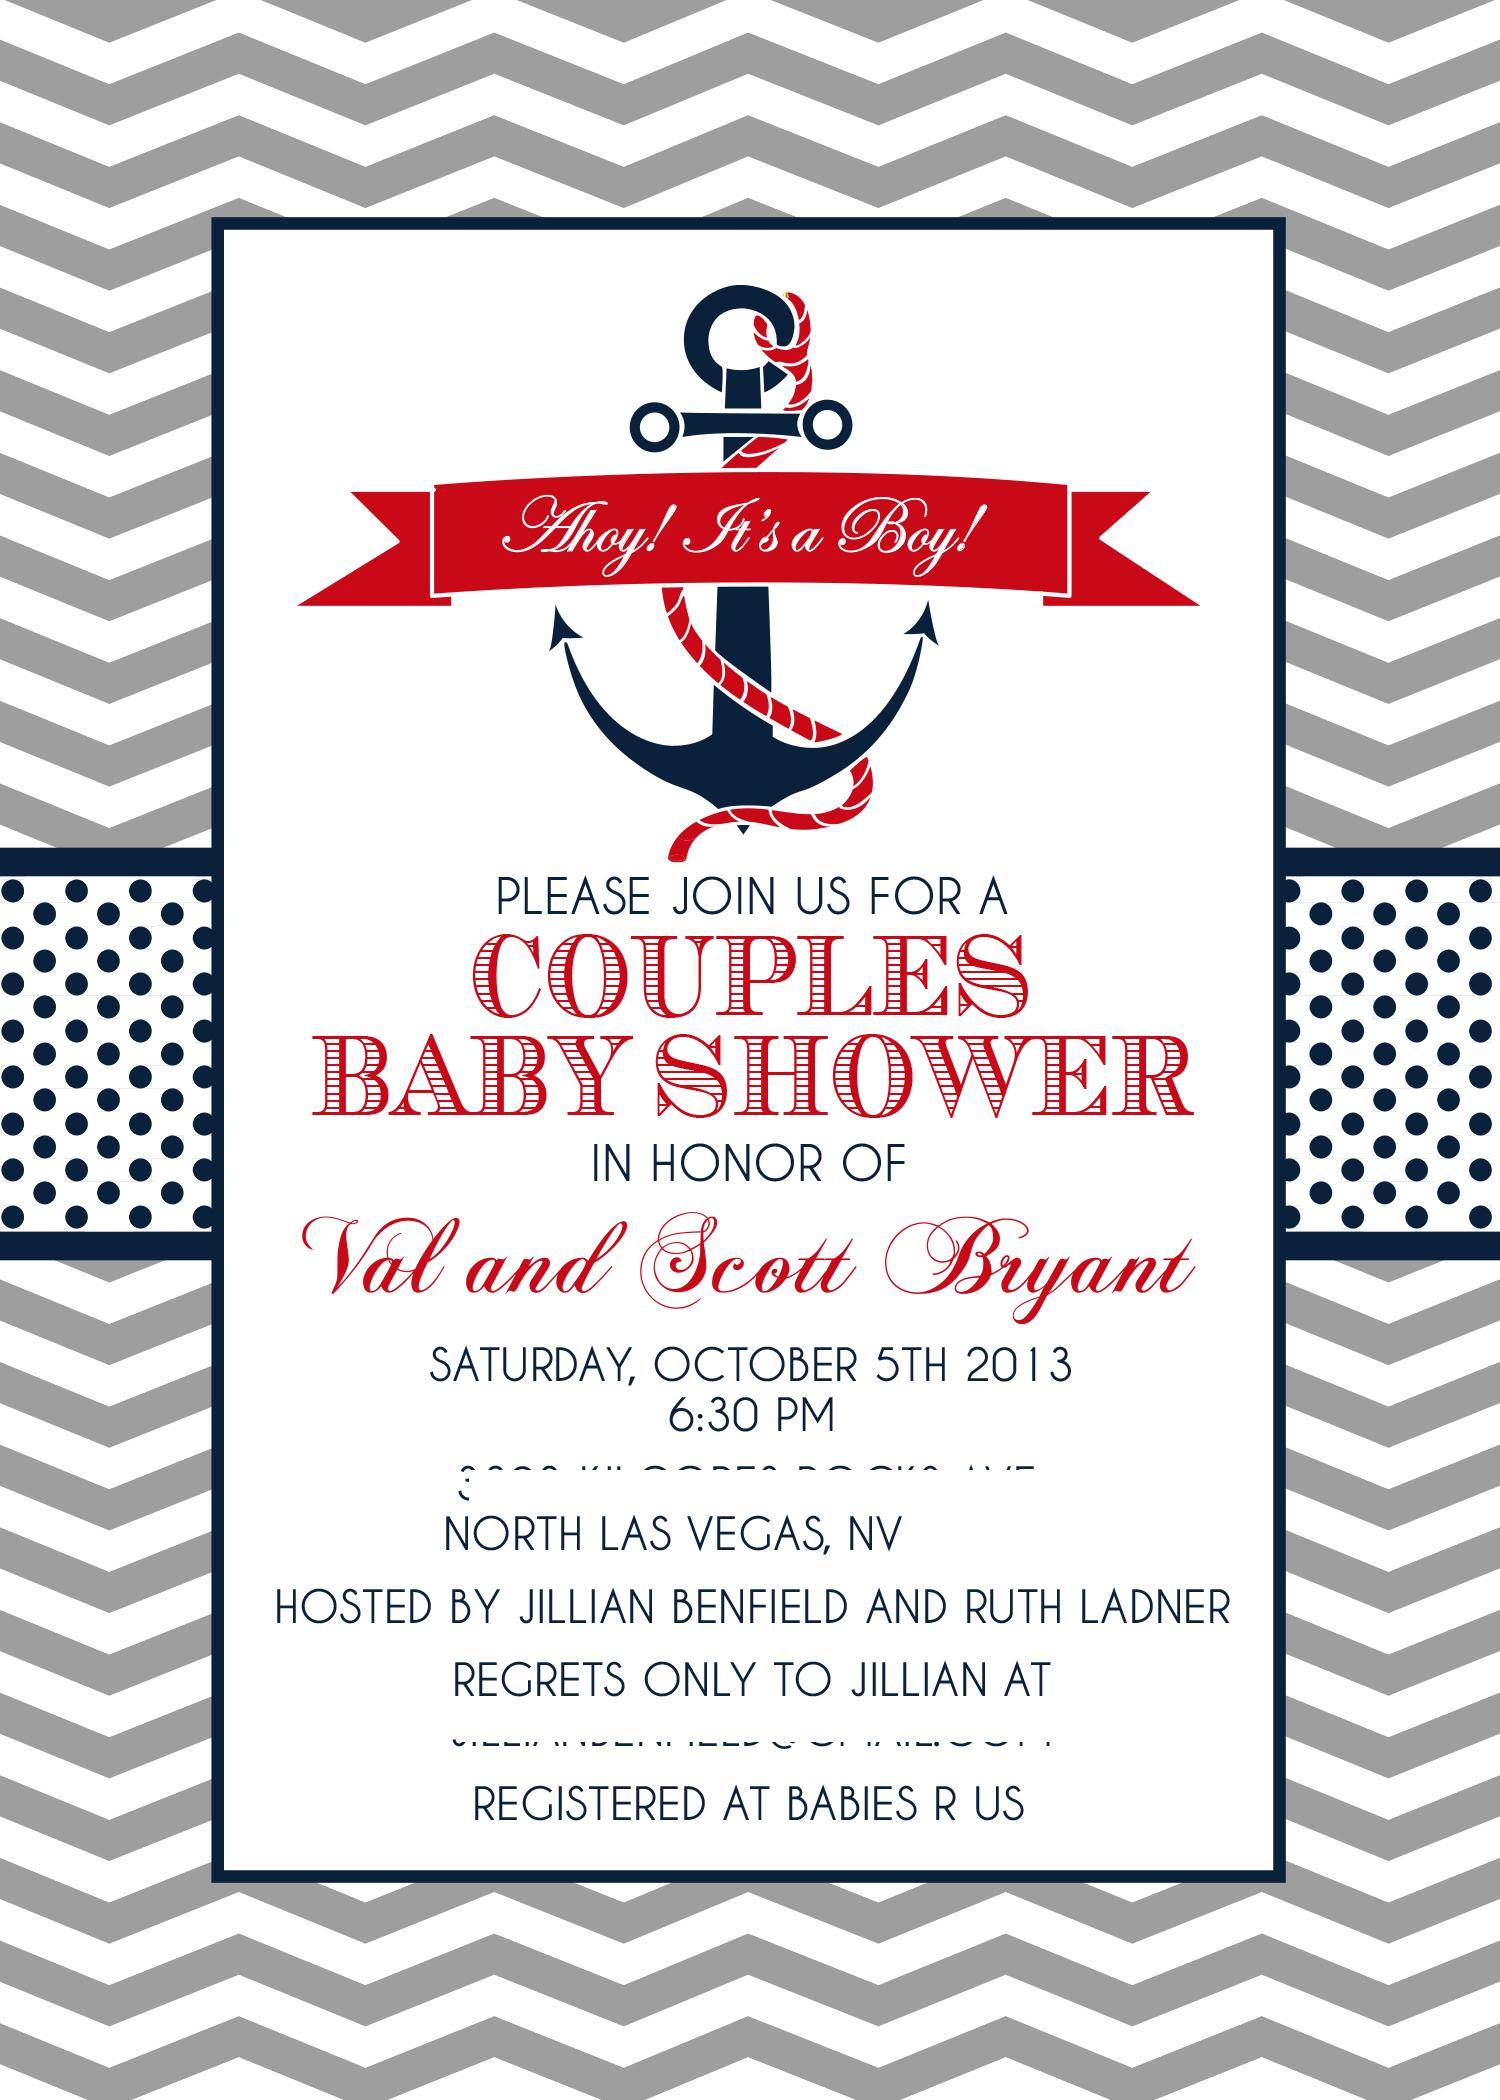 Sailor Baby Shower Invitation is luxury invitation example